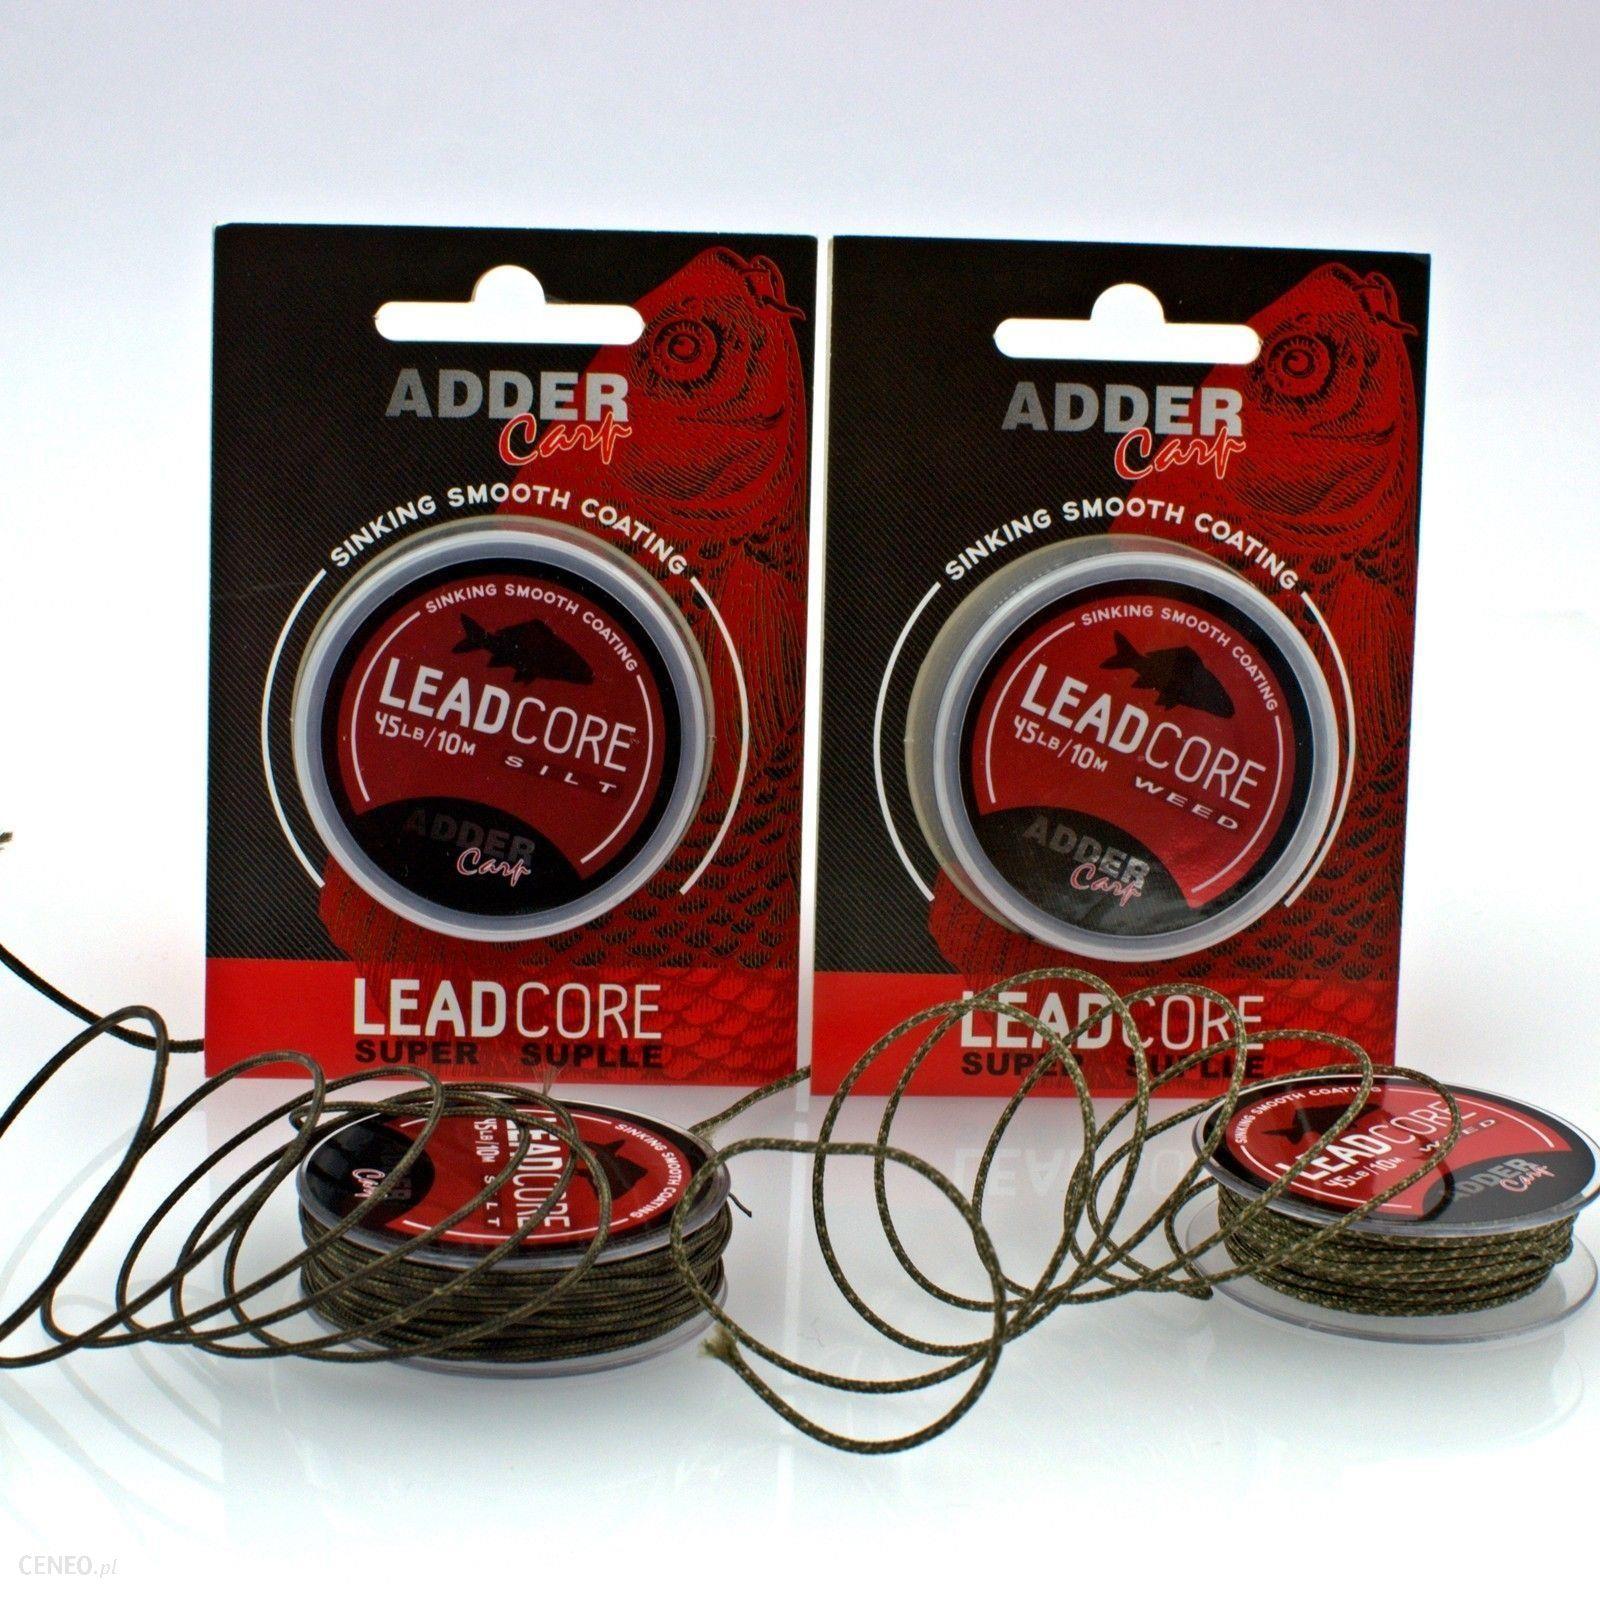 Adder Carp Ac Leadcore 10M 45Lb Weed